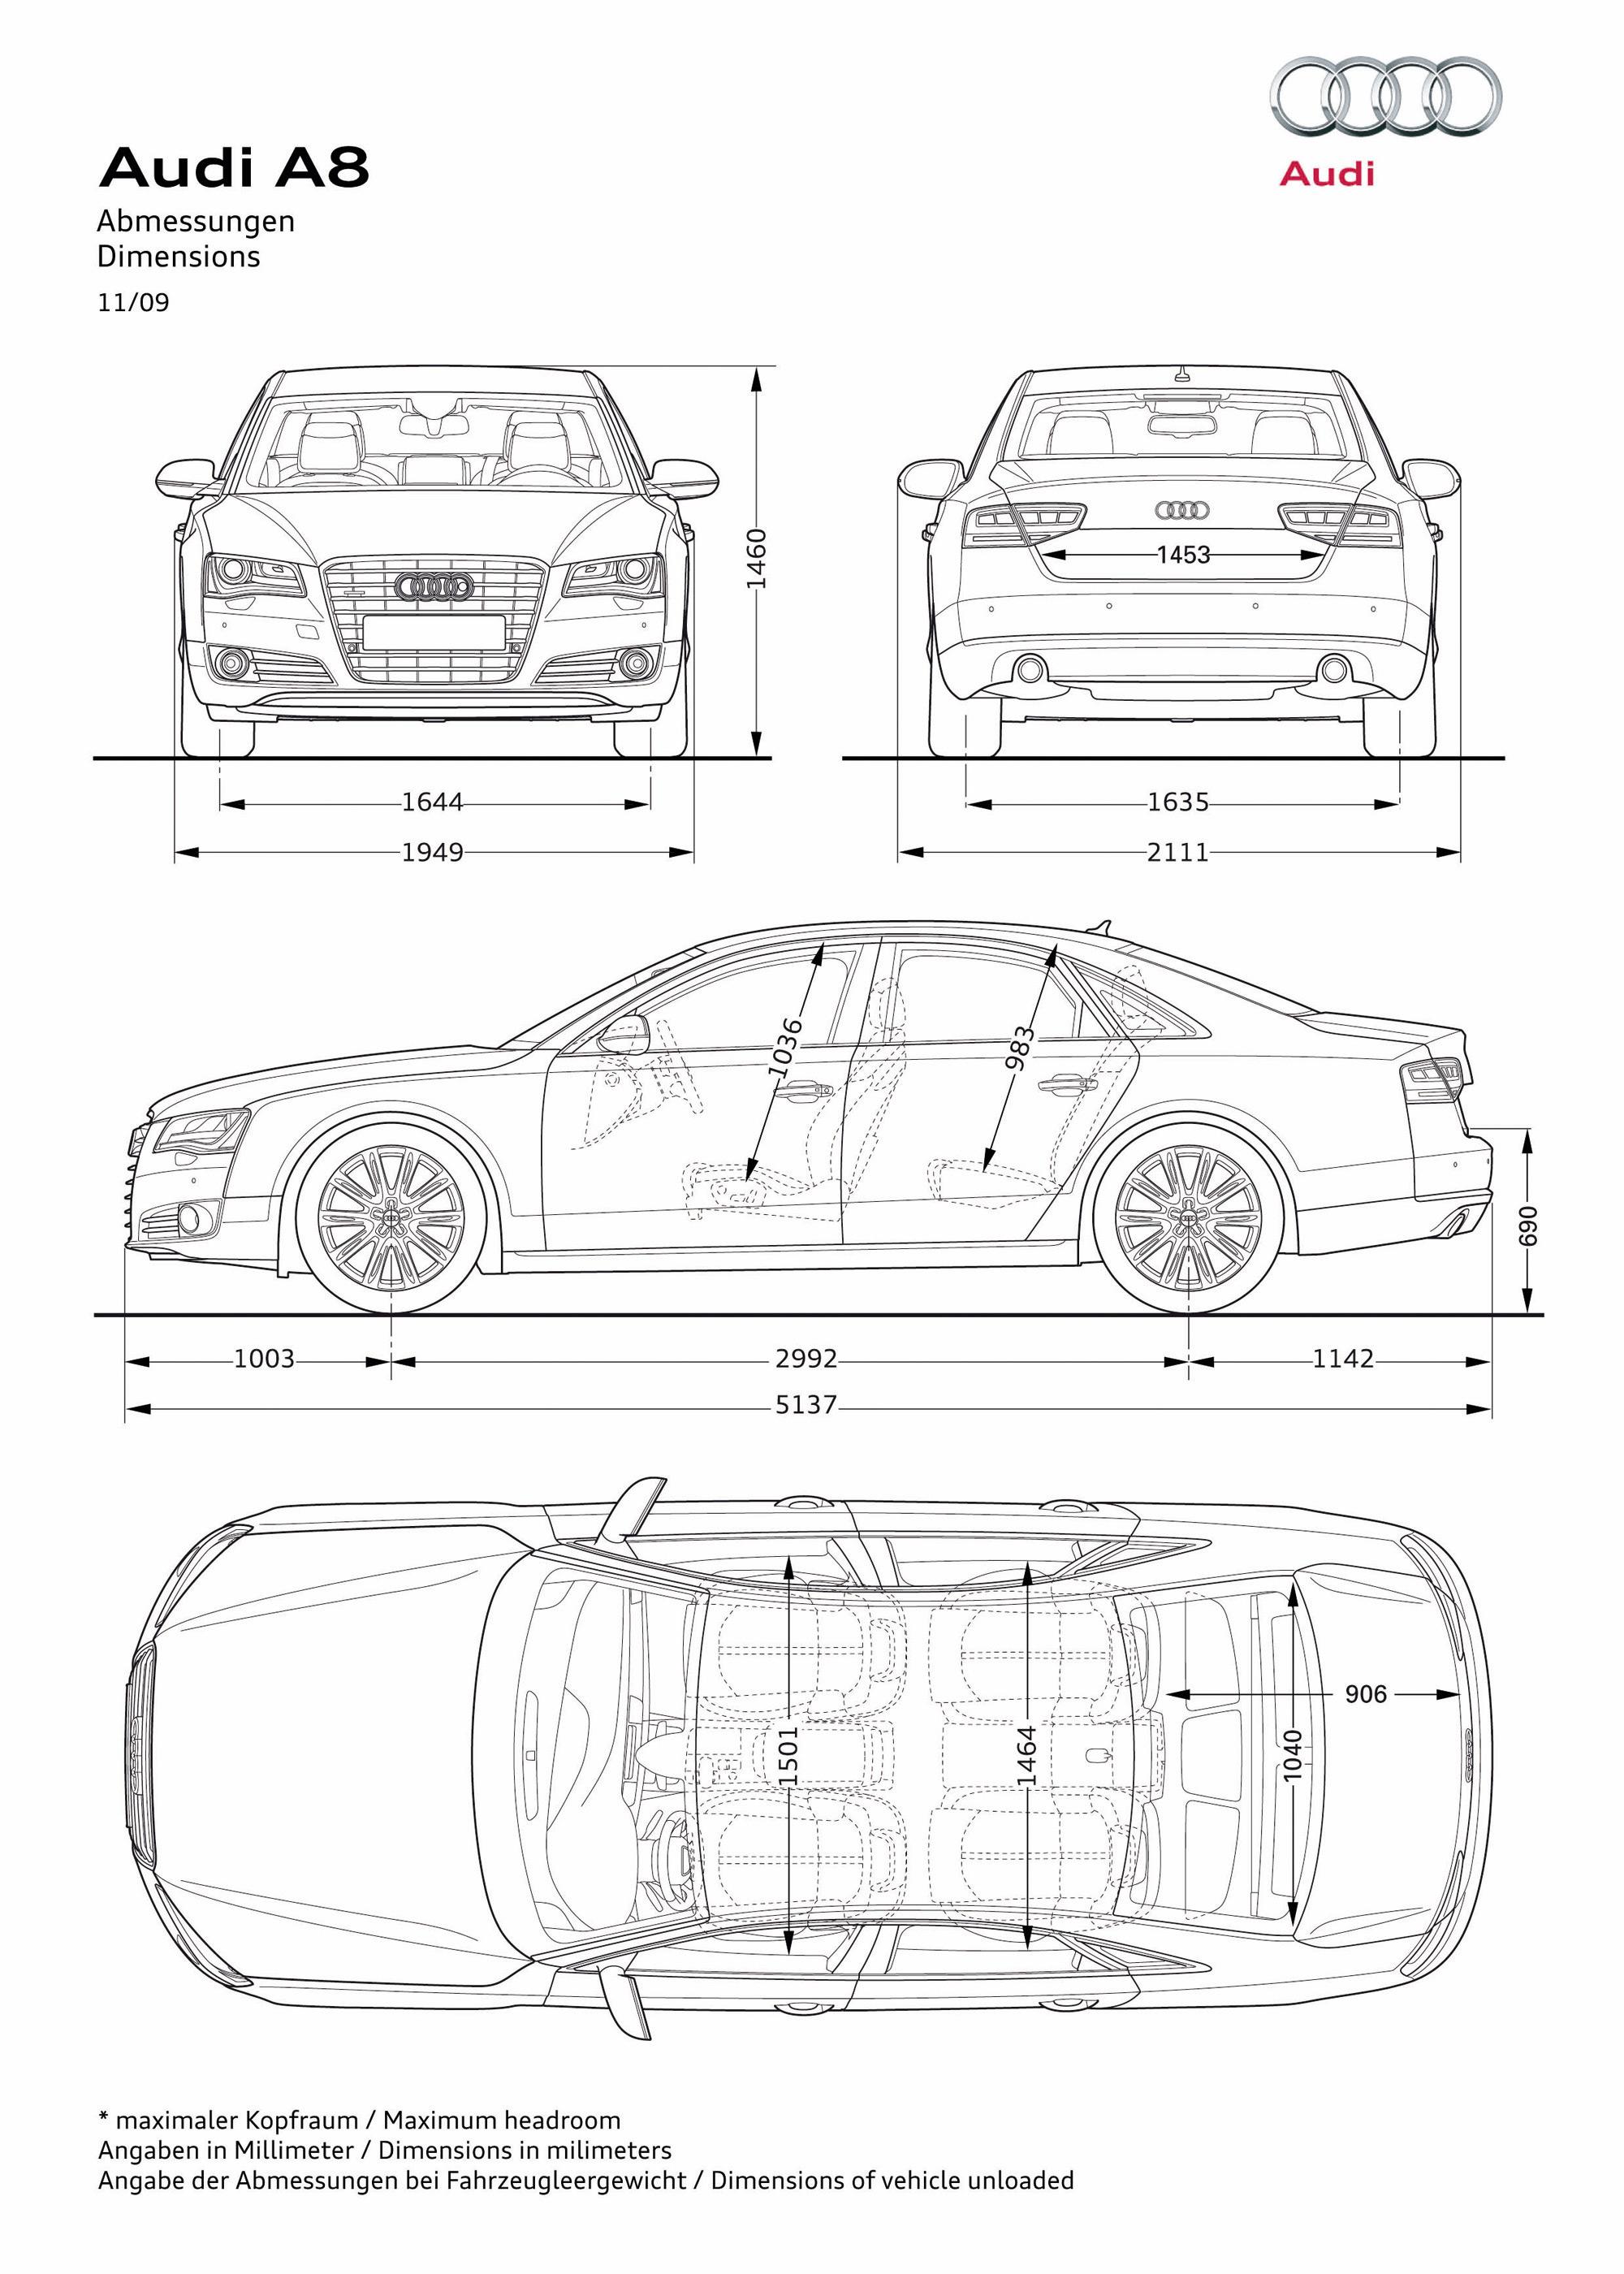 Ausmotive Audi A8 Photo Gallery